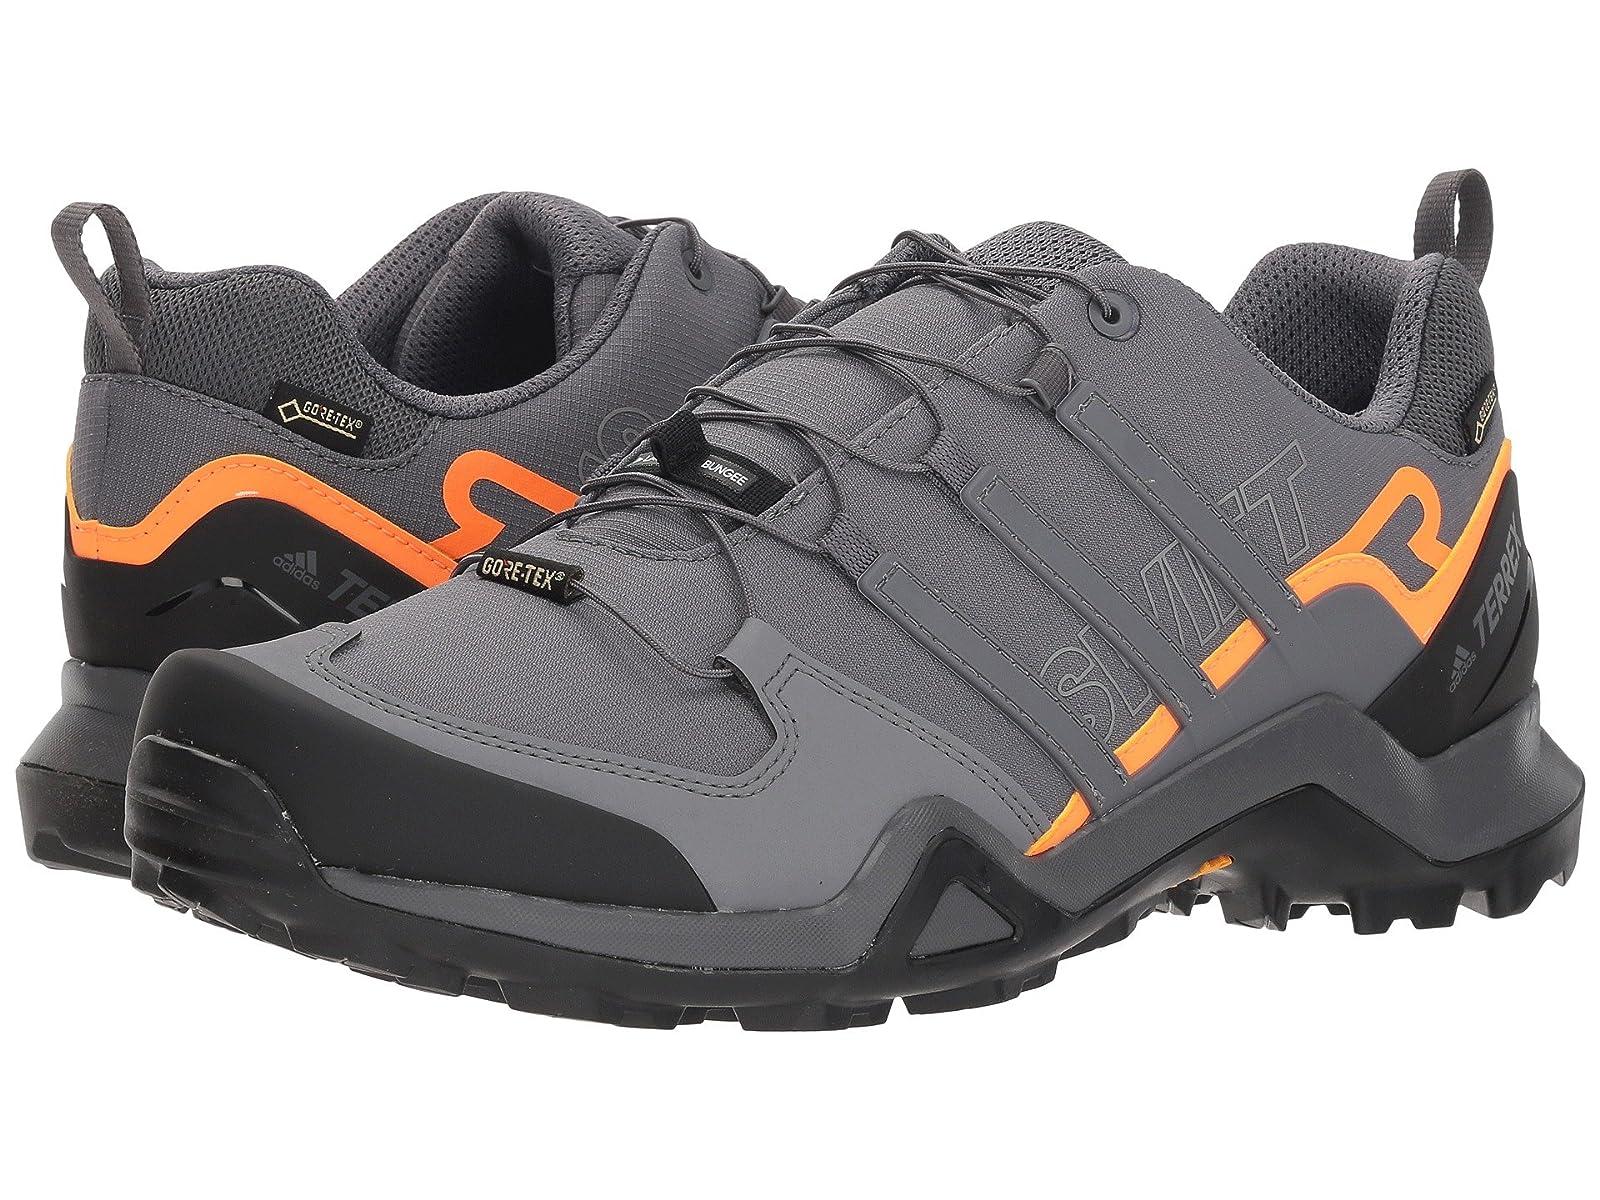 adidas Outdoor Terrex Swift of R2 GTX®-Take full advantage of Swift materials-Gentleman/Lady 1bca4f